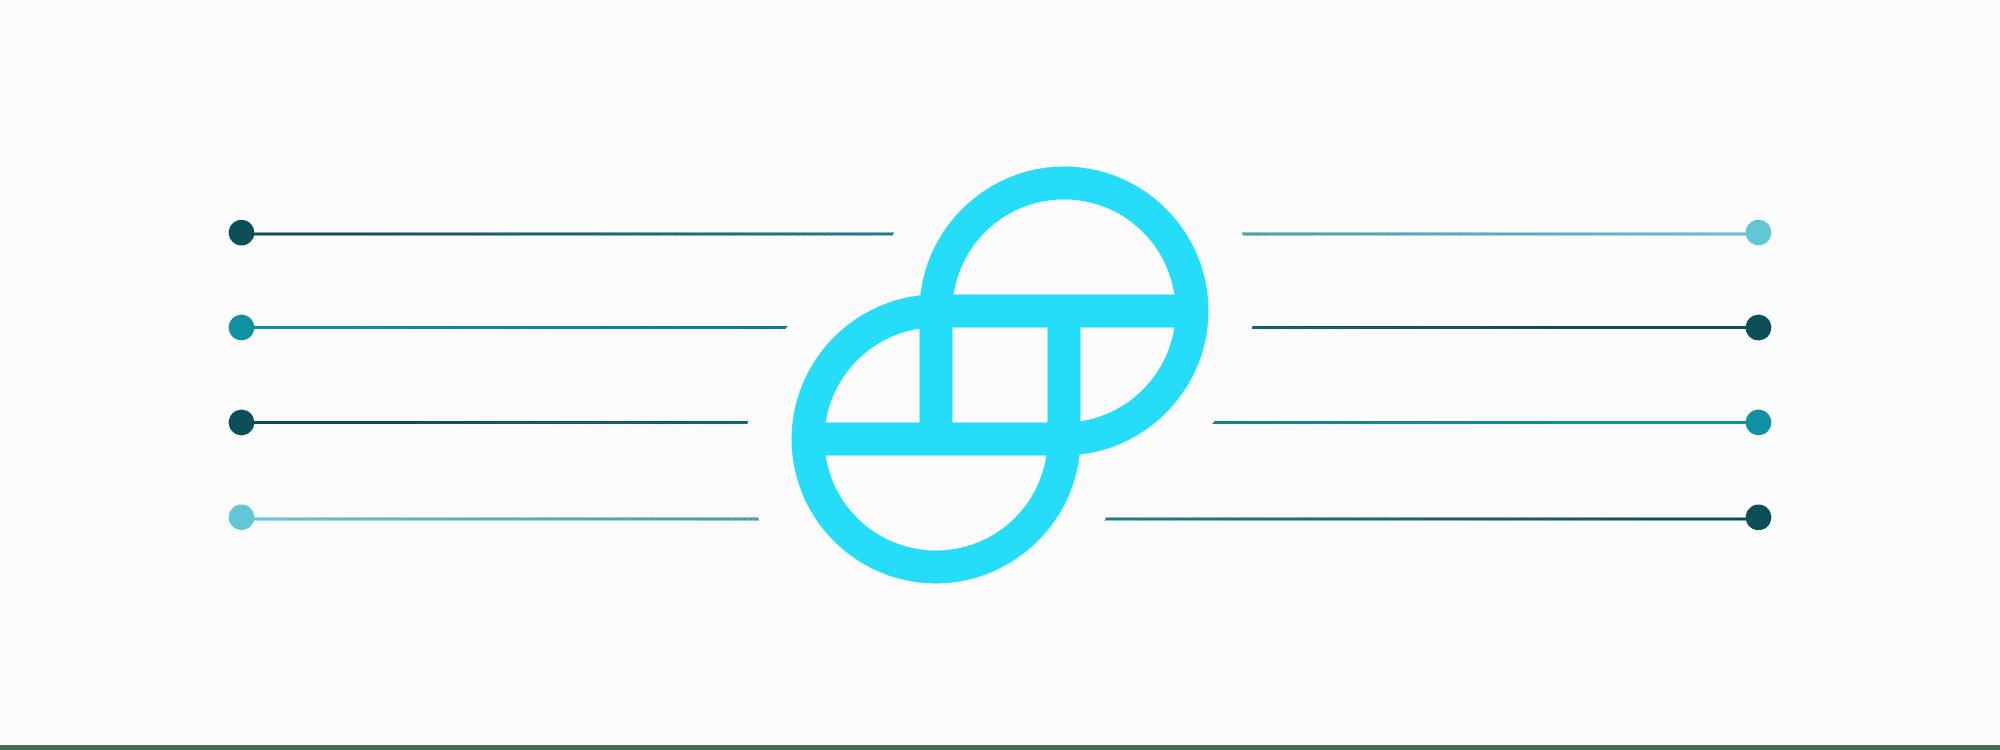 gemini-clearing otc trading service